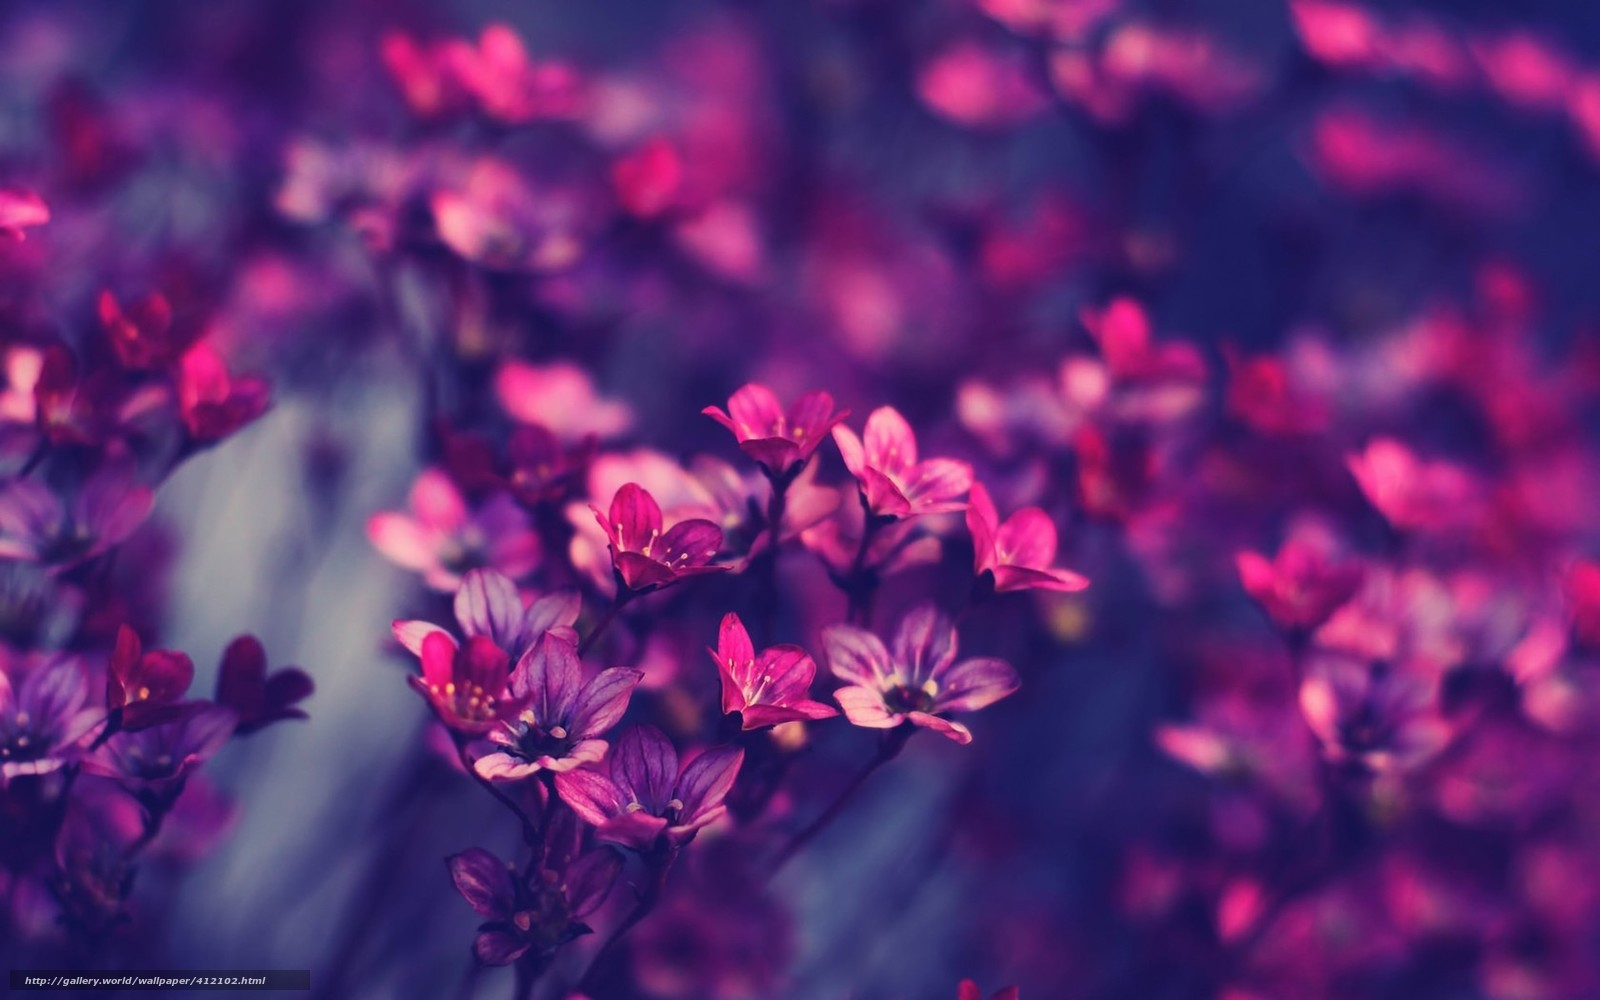 tlcharger fond d'ecran fleurs, beau, violet, rose fonds d'ecran